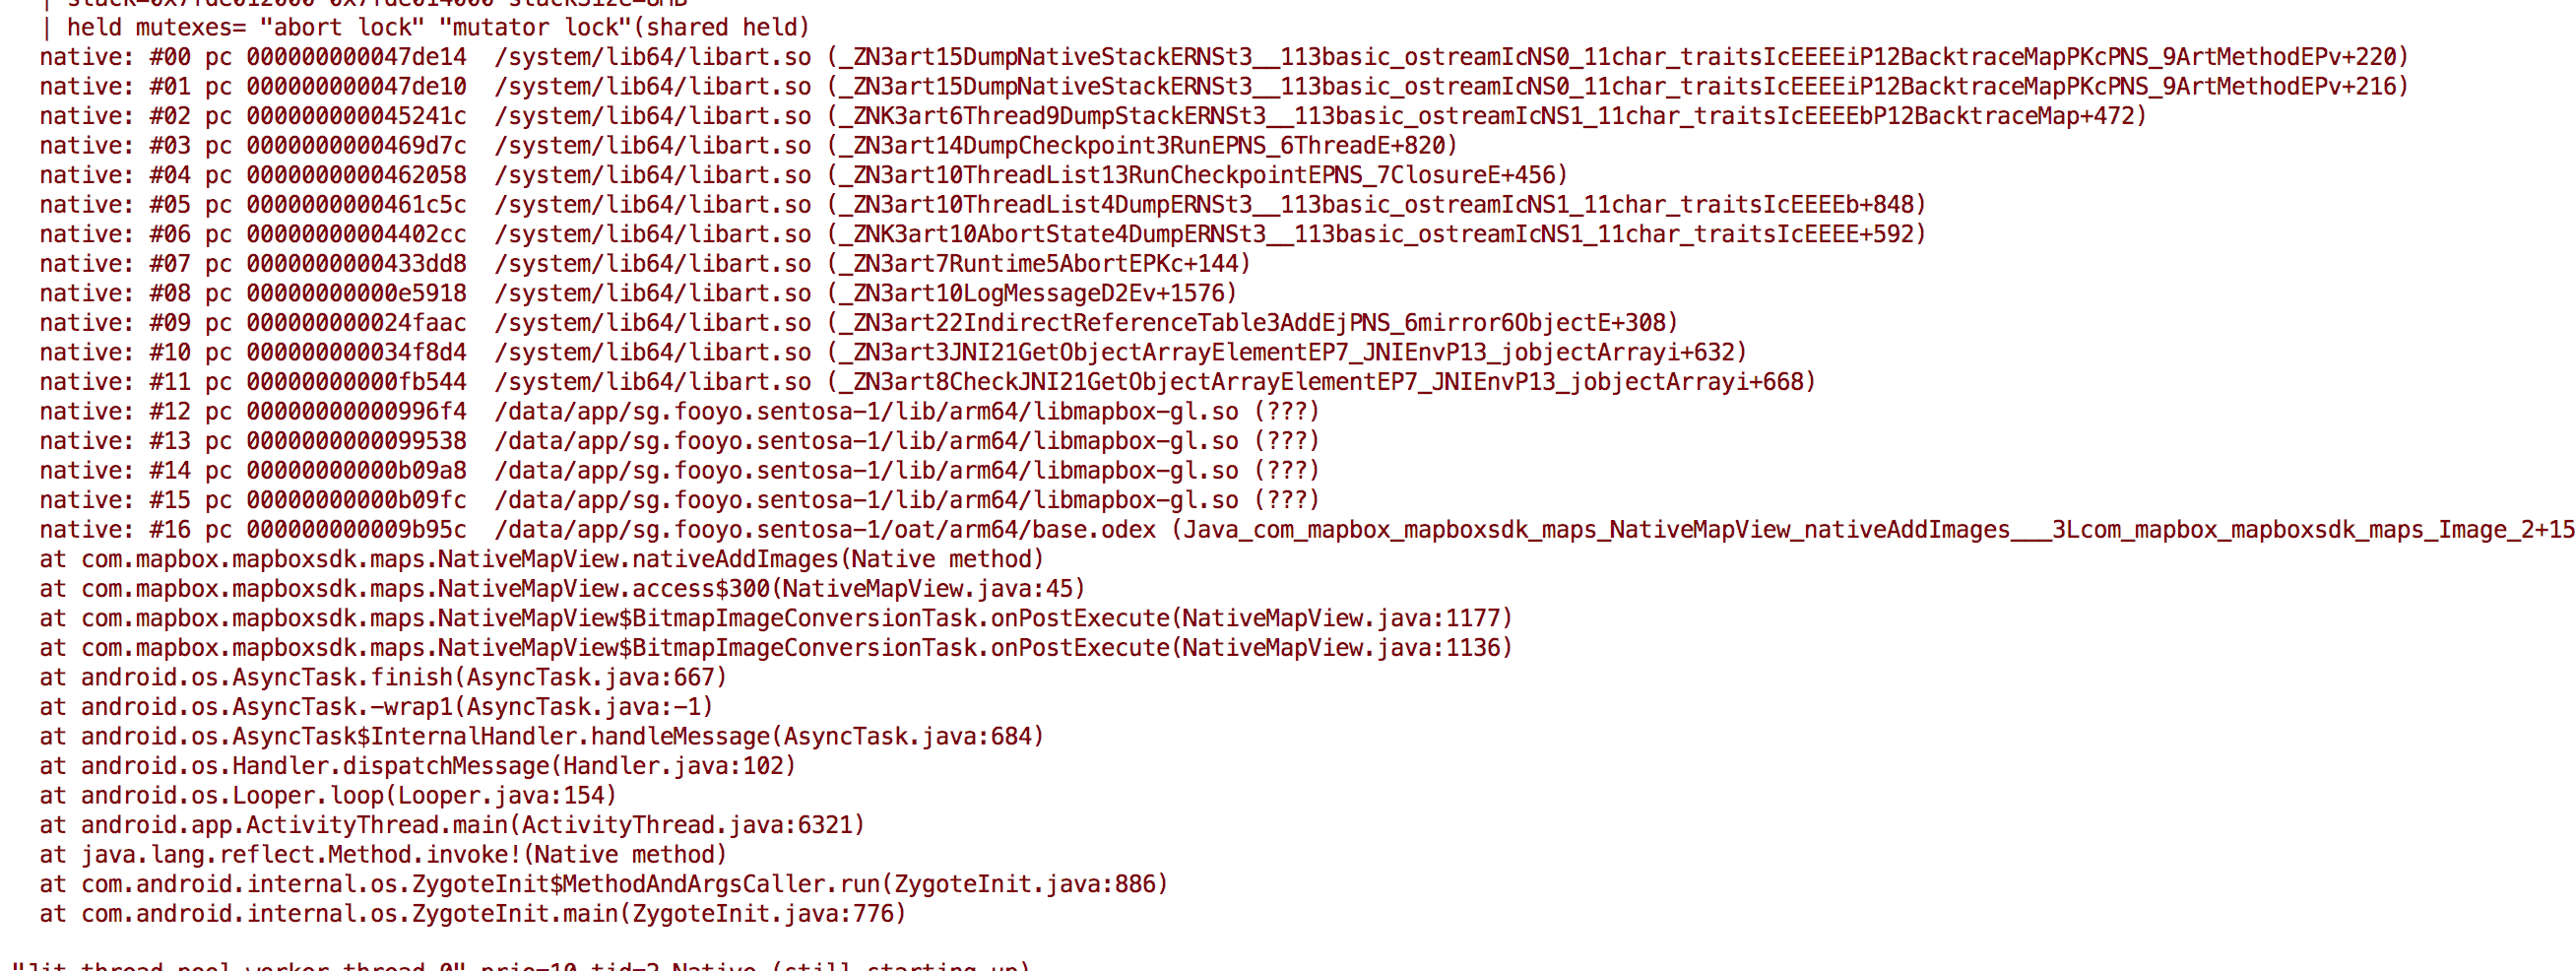 art/runtime/indirect_reference_table cc:132] JNI ERROR (app